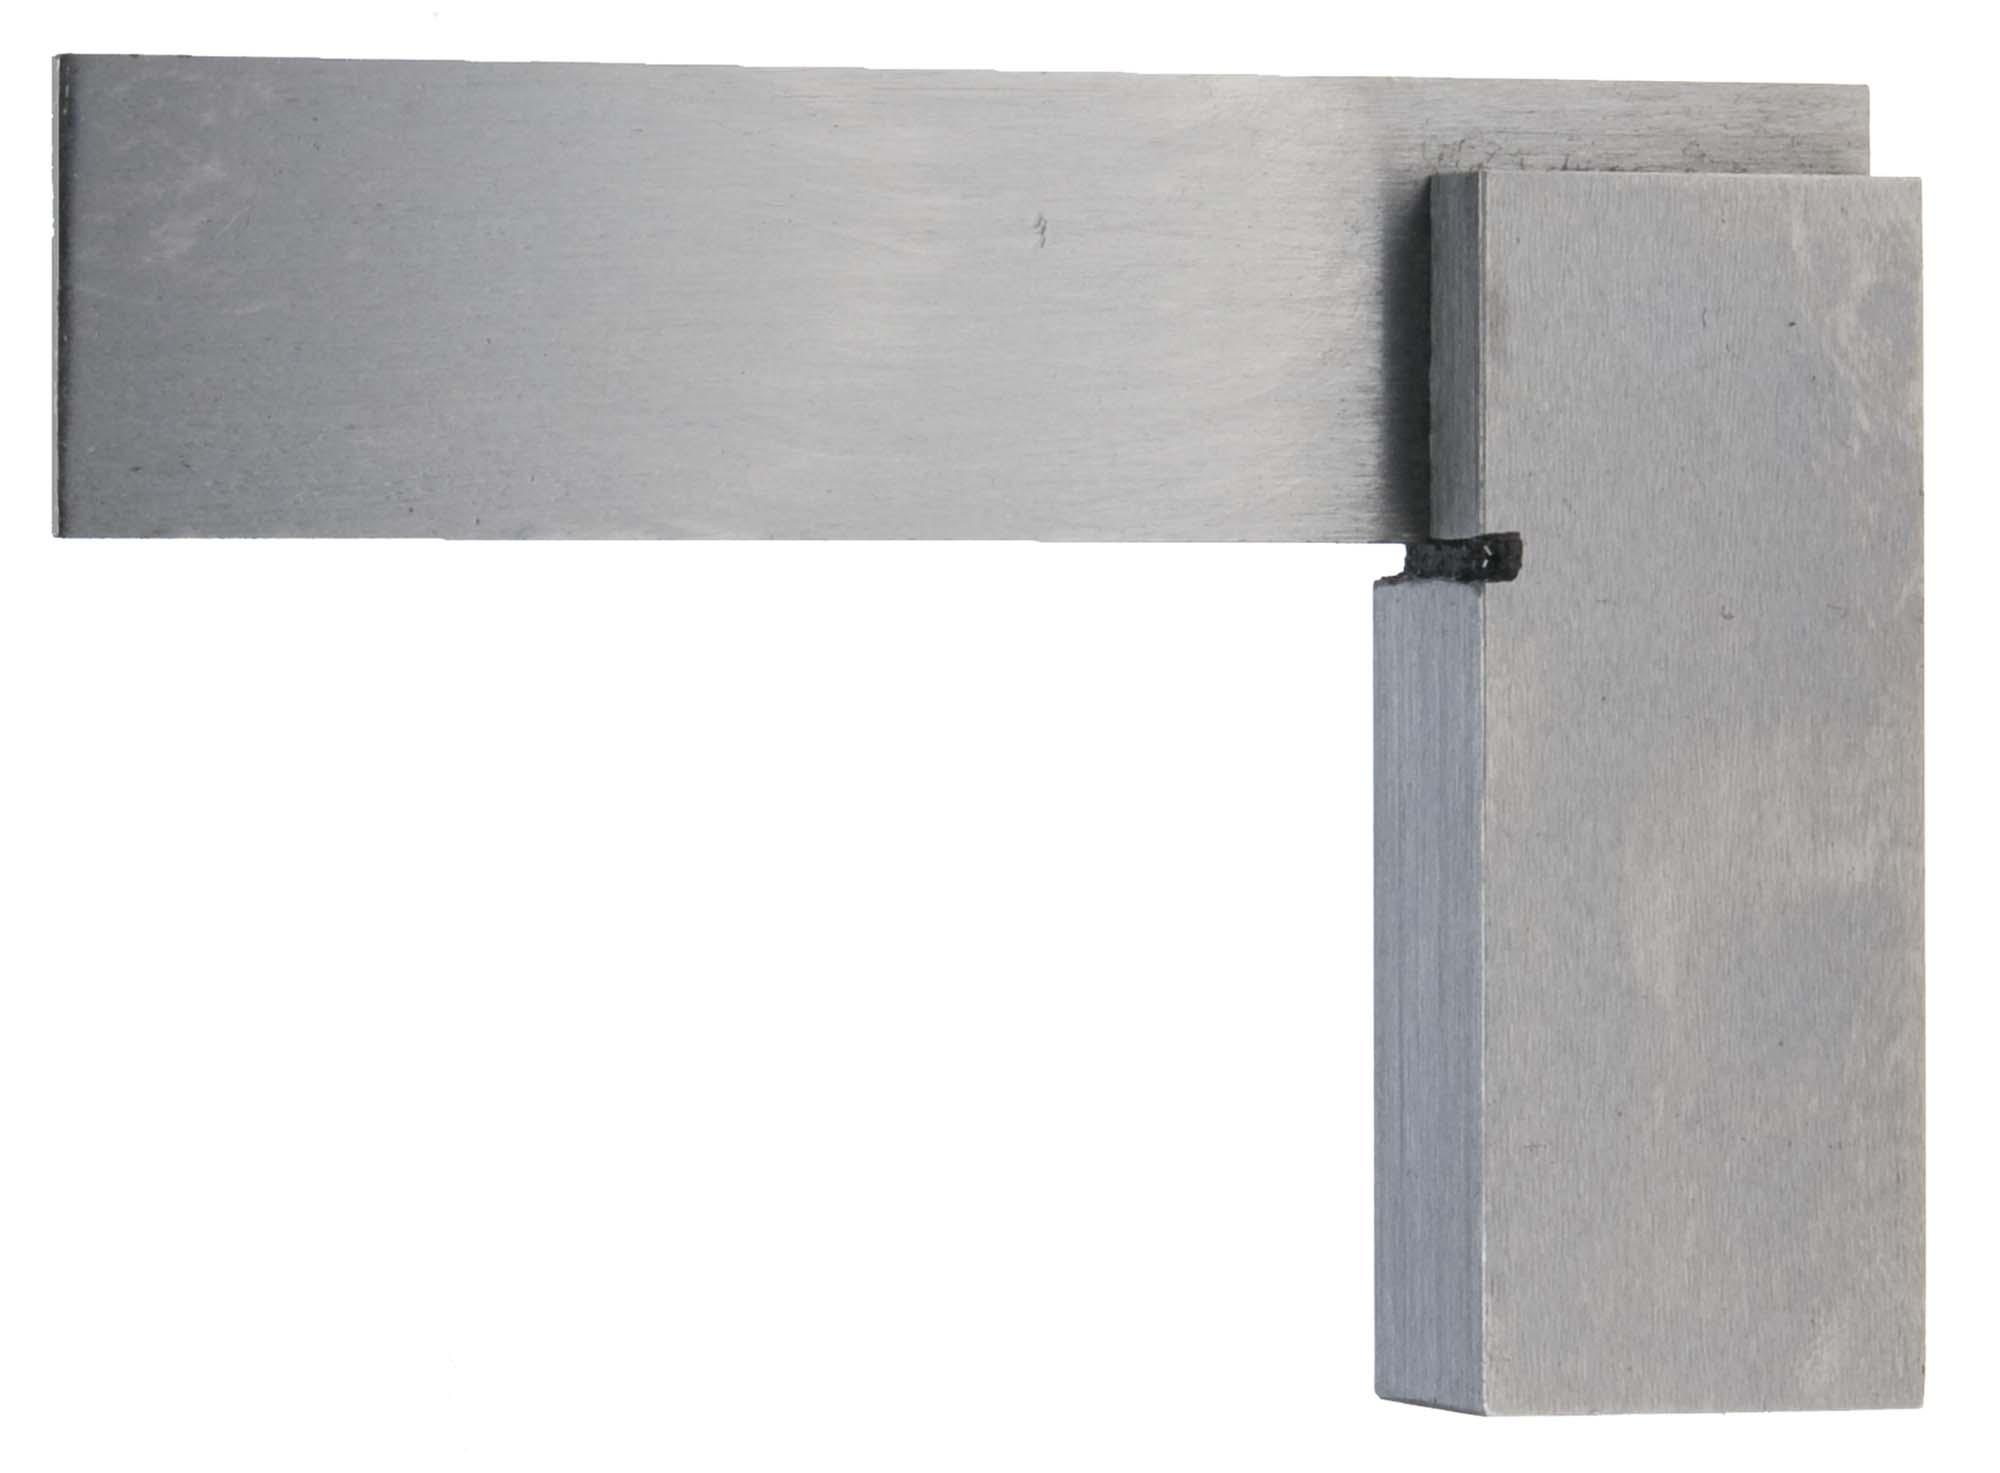 "SQ-6  6"" Hardened Steel Square"